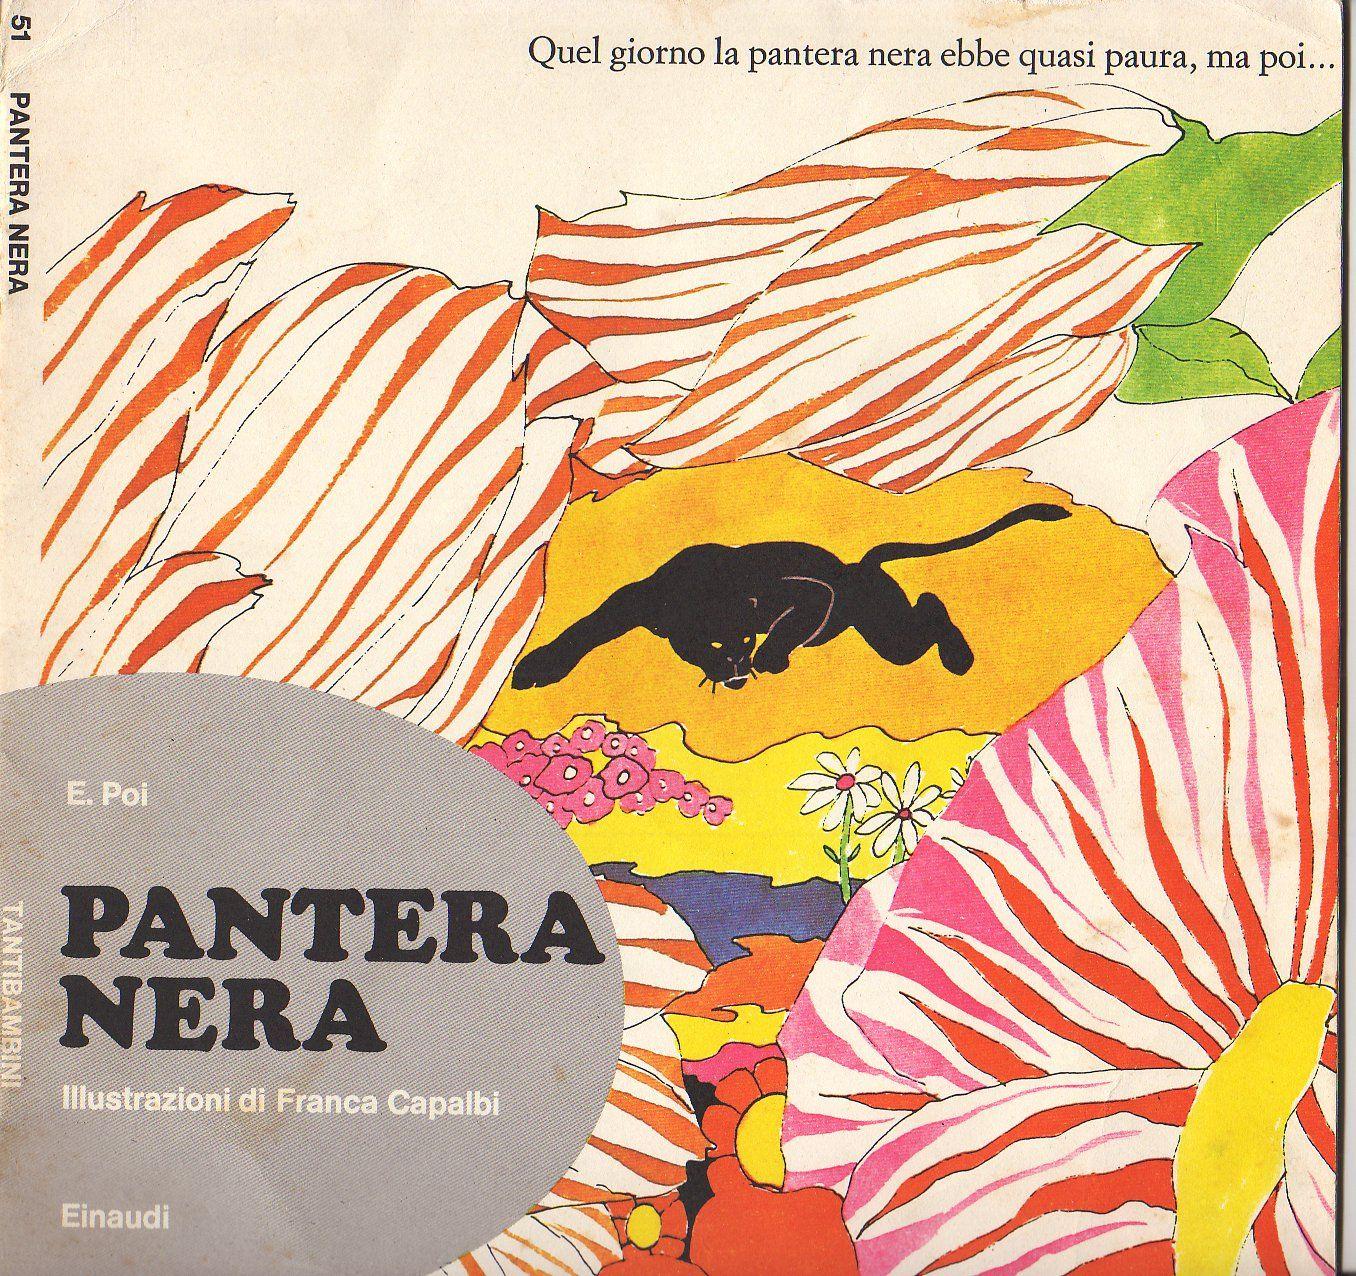 TantiBambini - Pantera nera E. Poi - Franca Capalbi copertina ...